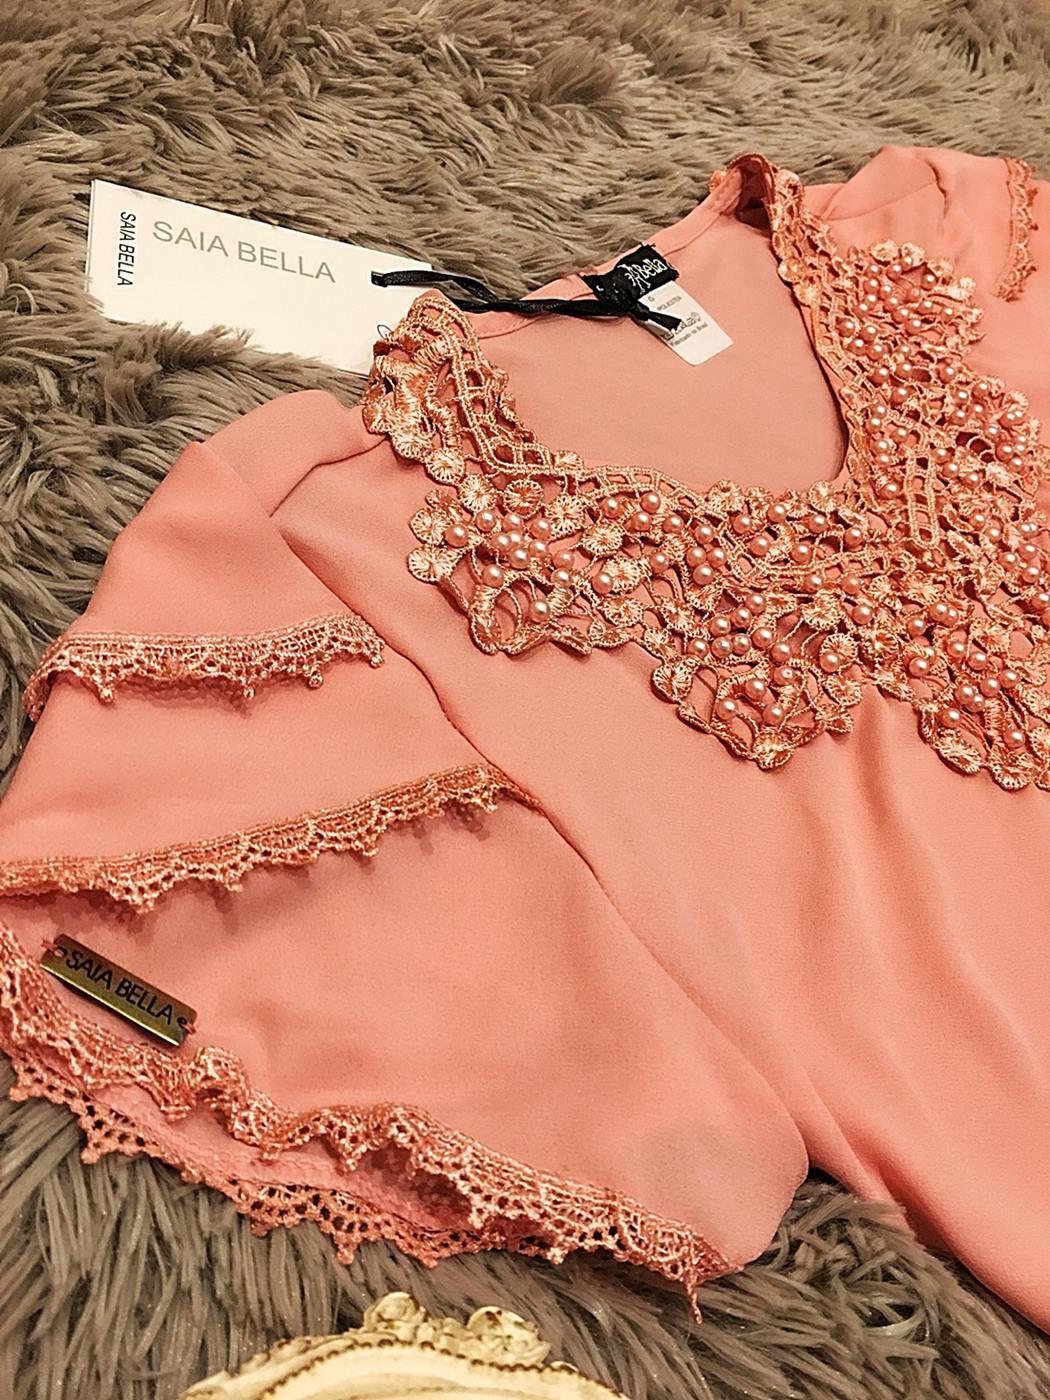 Blusa de Renda Saia Bella - SB9963 rose